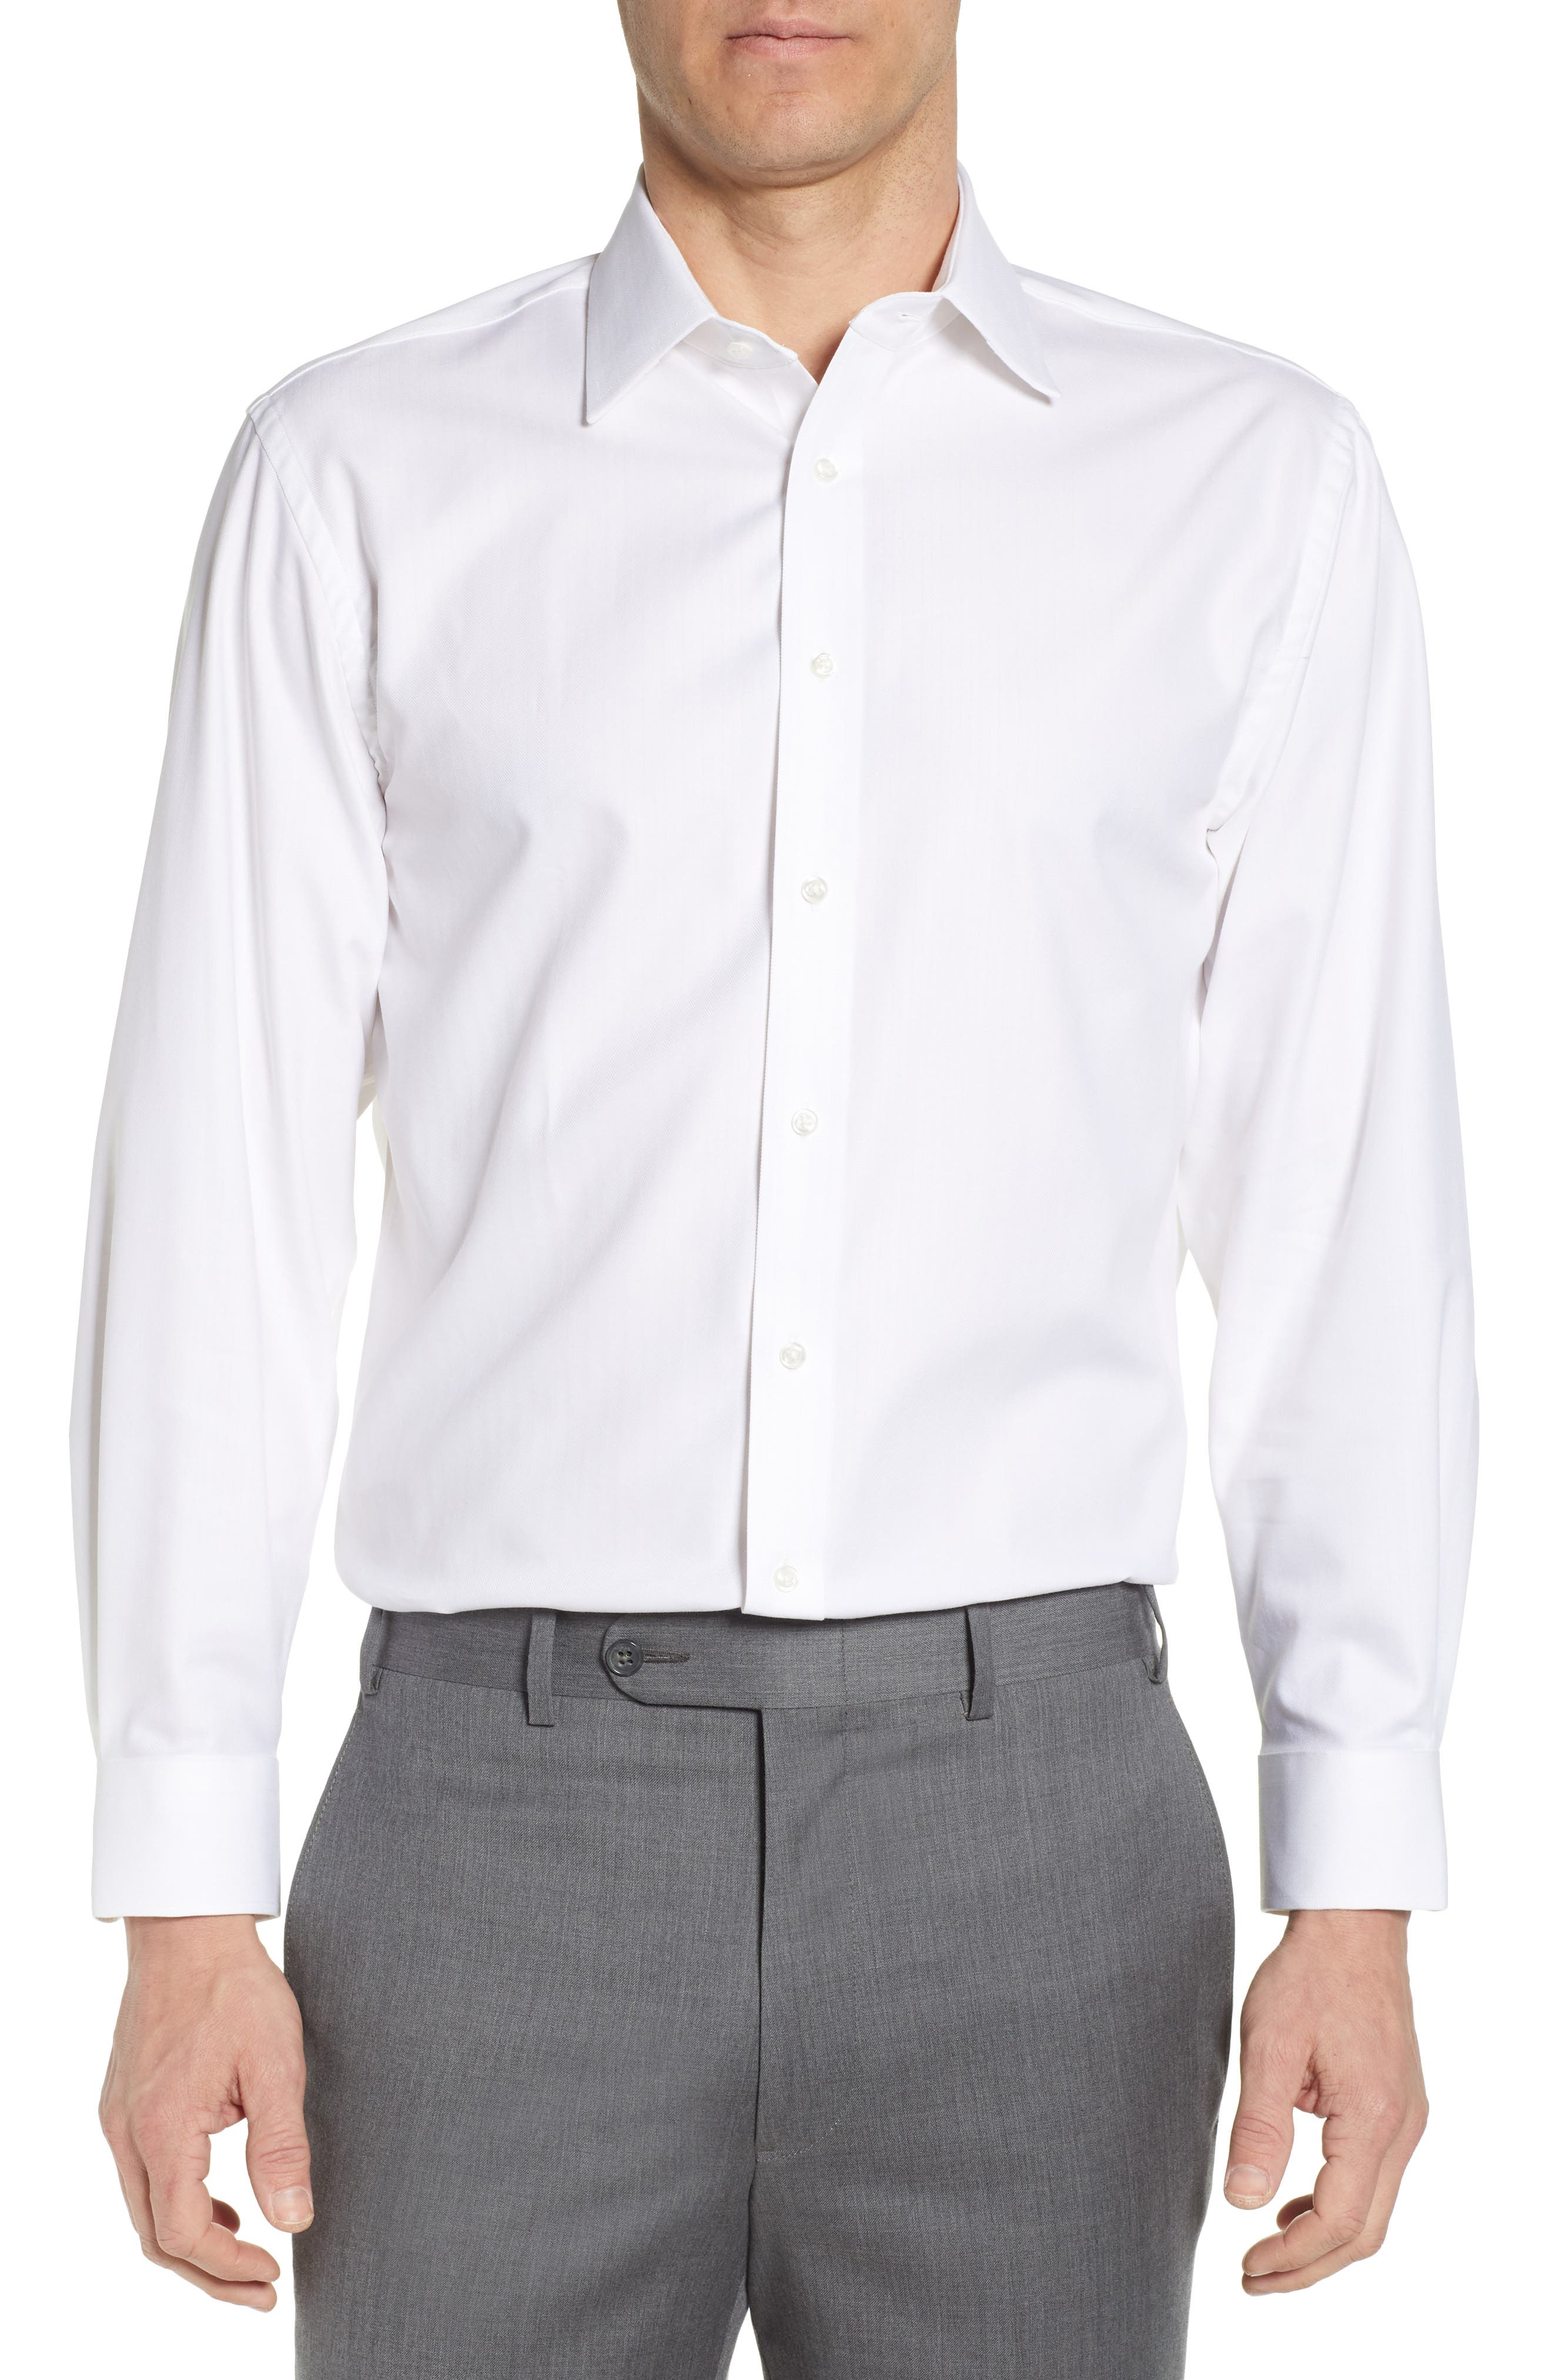 NORDSTROM MEN'S SHOP Tech-Smart Traditional Fit Stretch Herringbone Dress Shirt, Main, color, WHITE